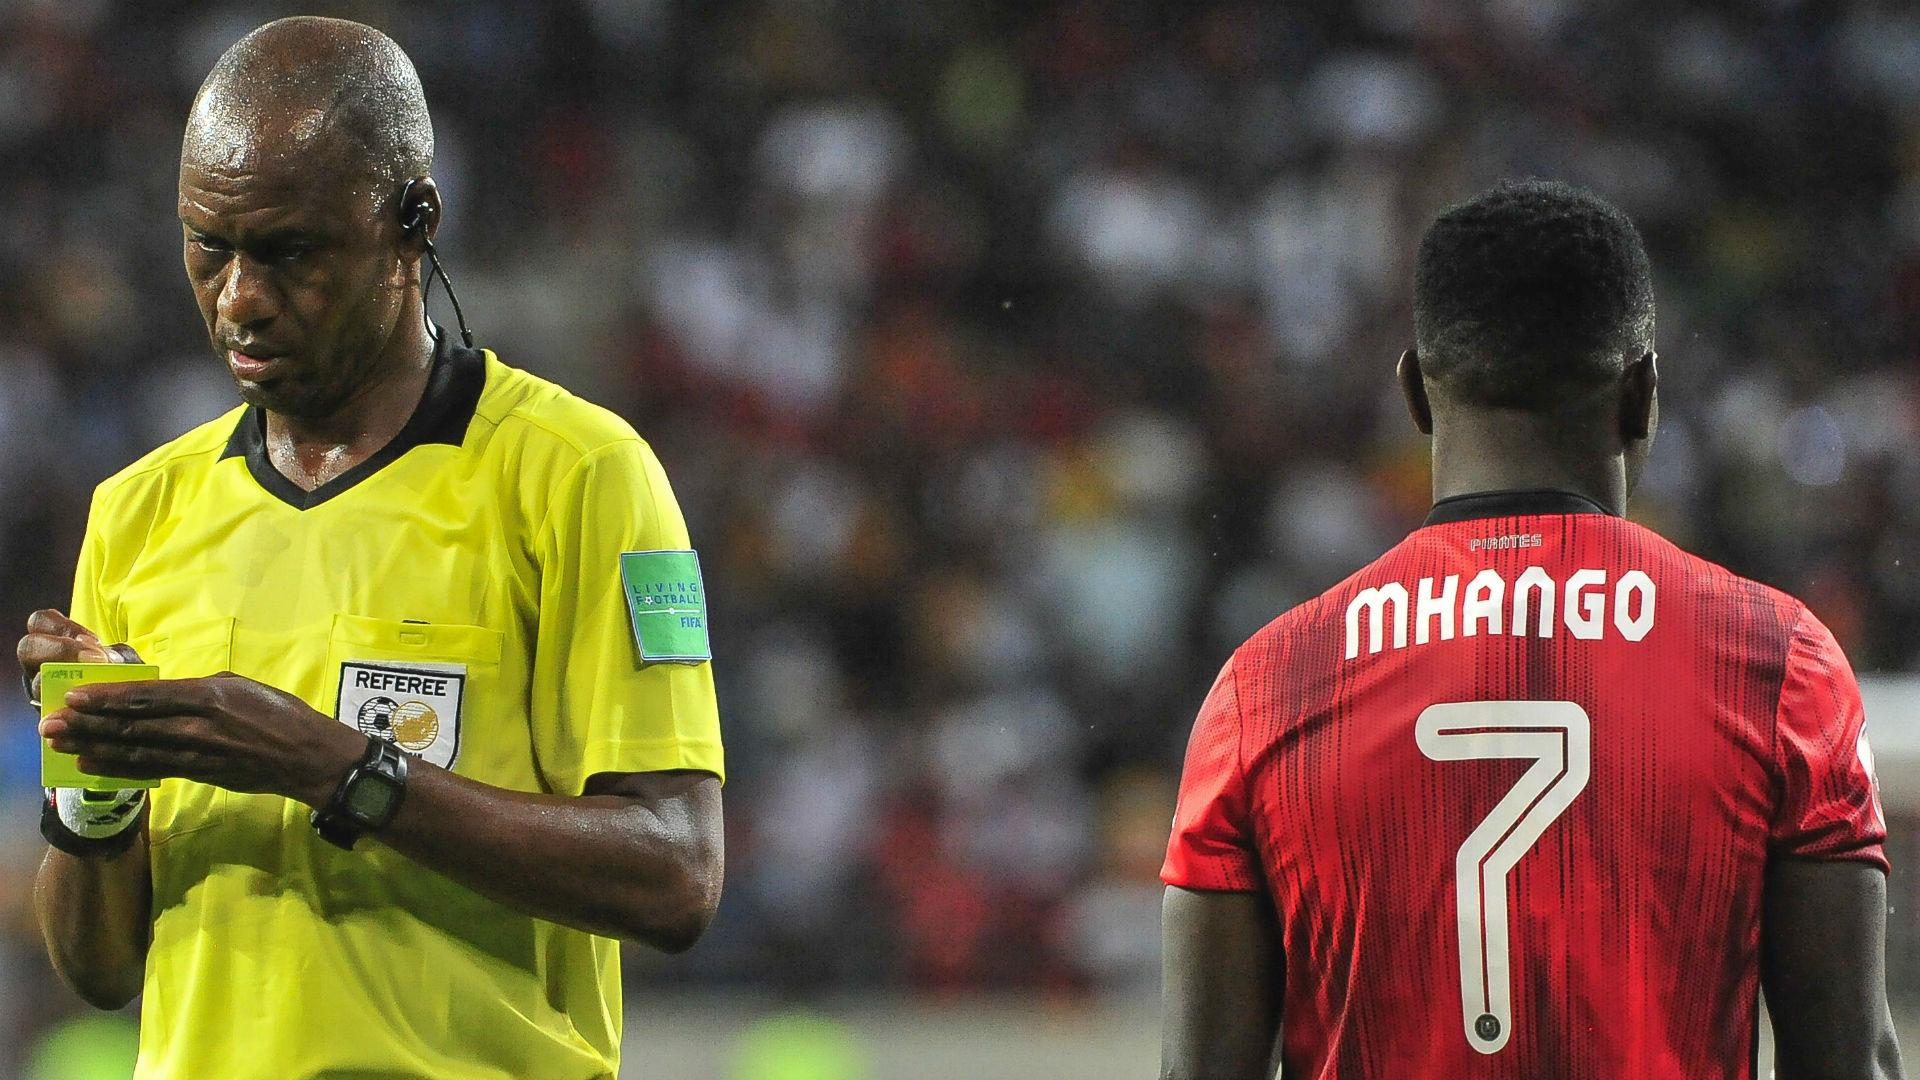 Golden Boot 2019-20: Mhango, Grobler and the PSL's top scorers